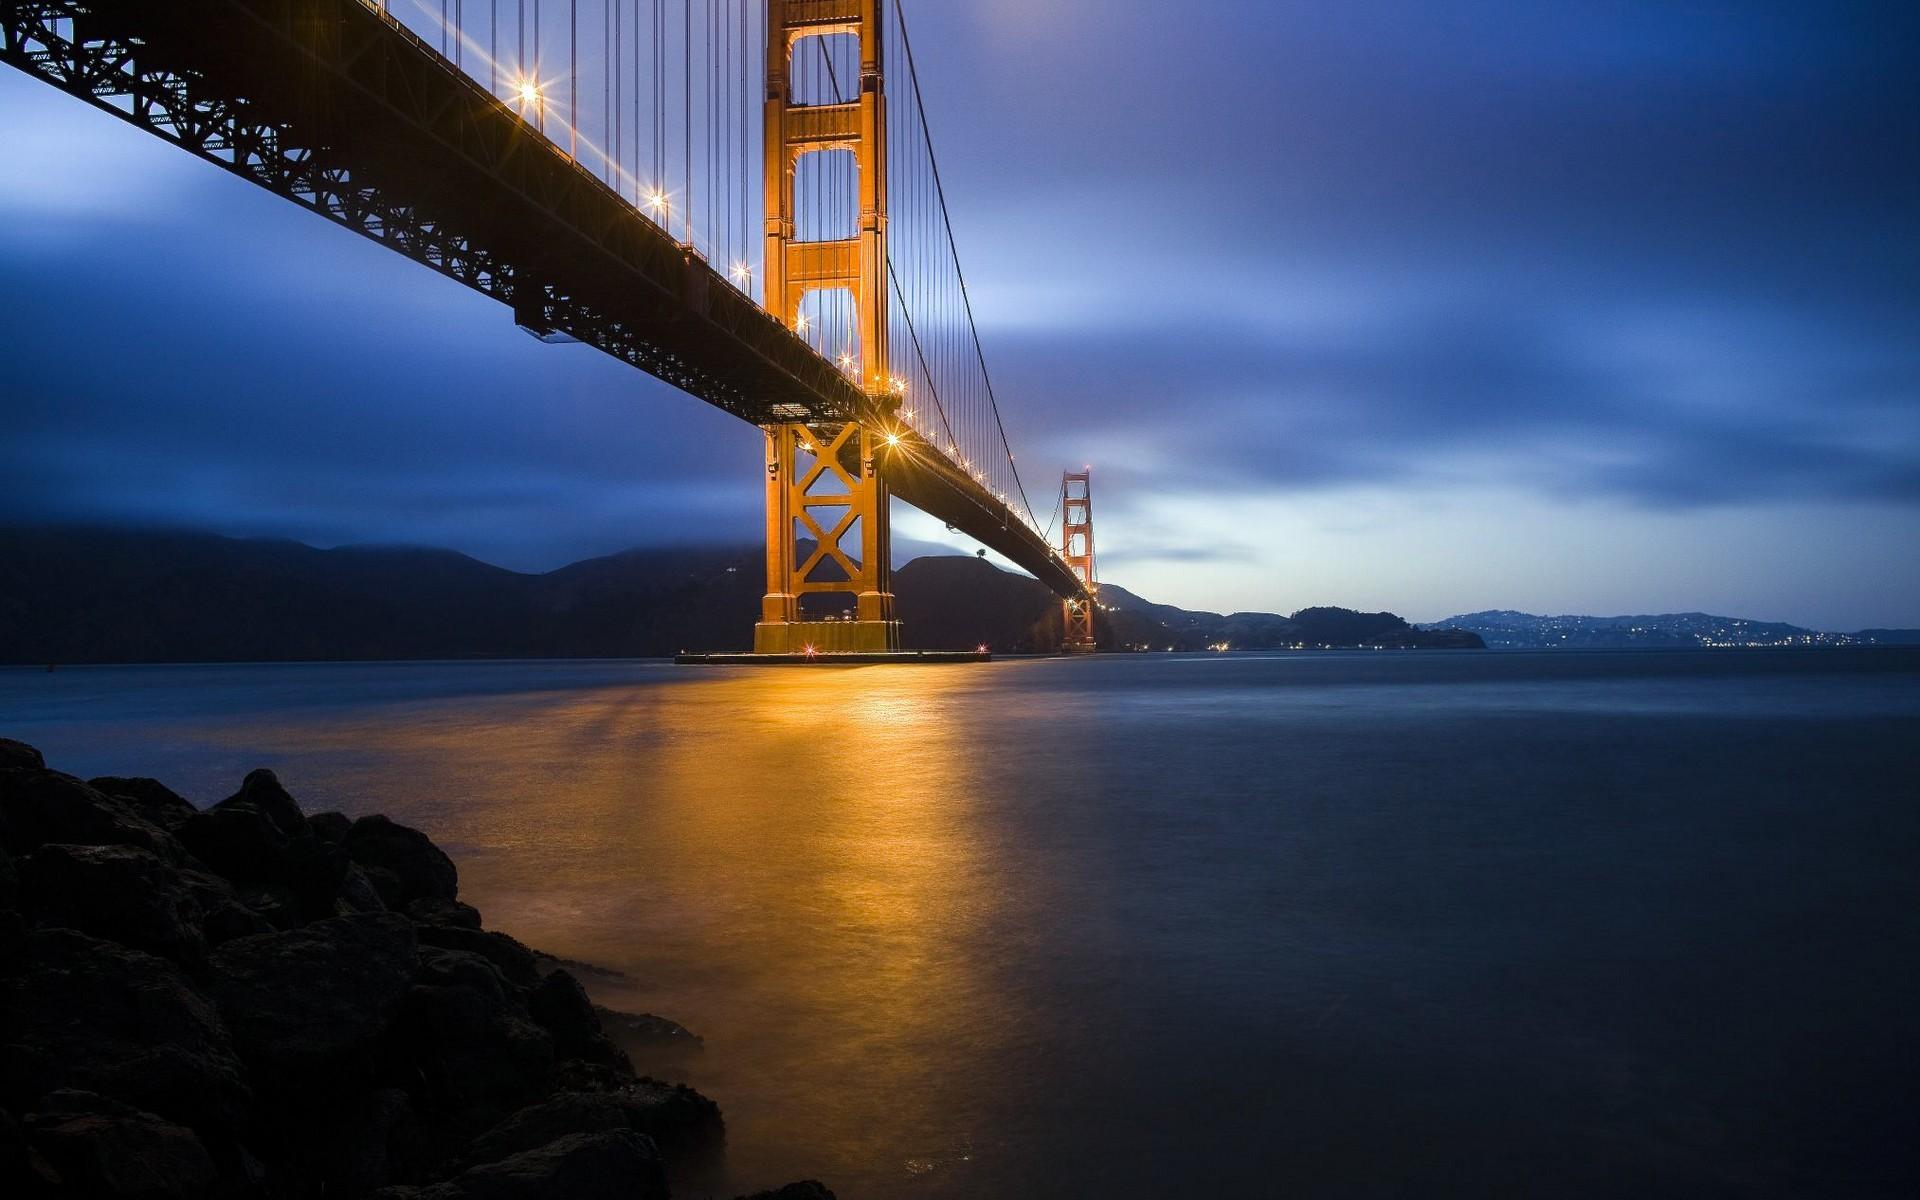 General 1920x1200 bridge suspension bridge Golden Gate Bridge dusk street light